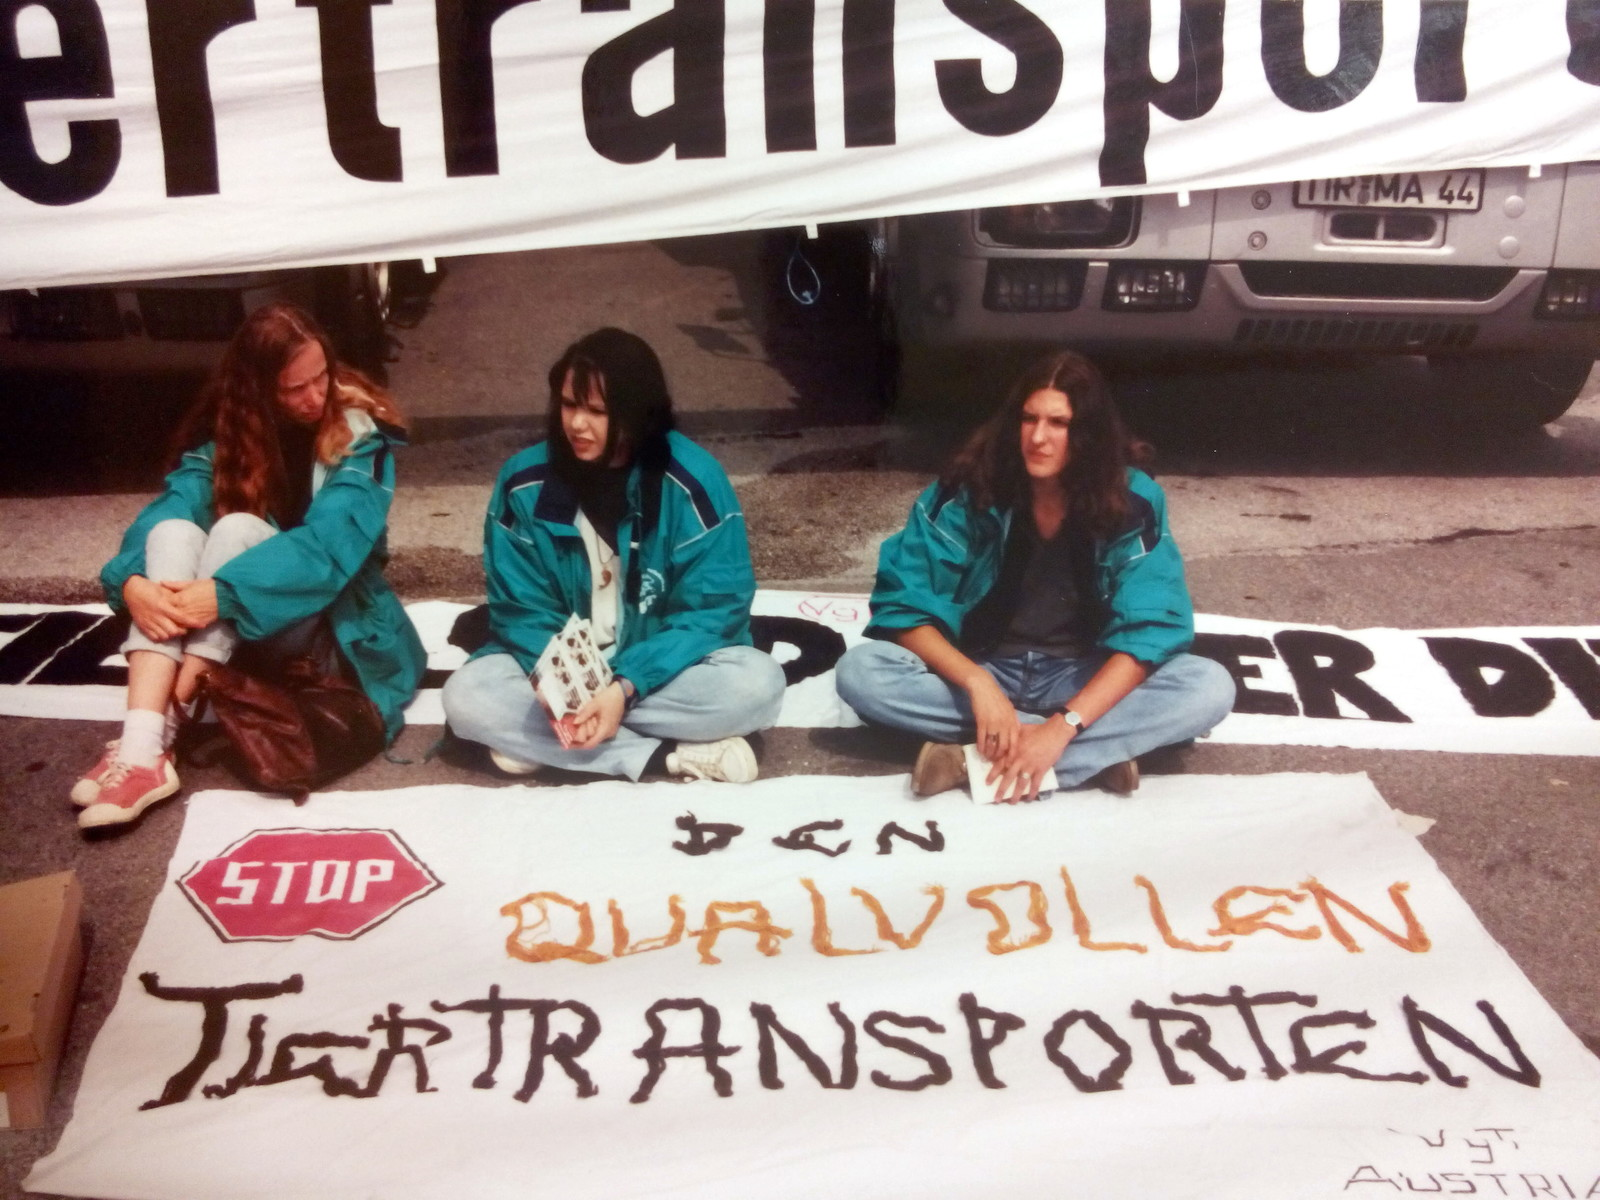 1996-07-26-tiertransport-blockade-salzburg-01